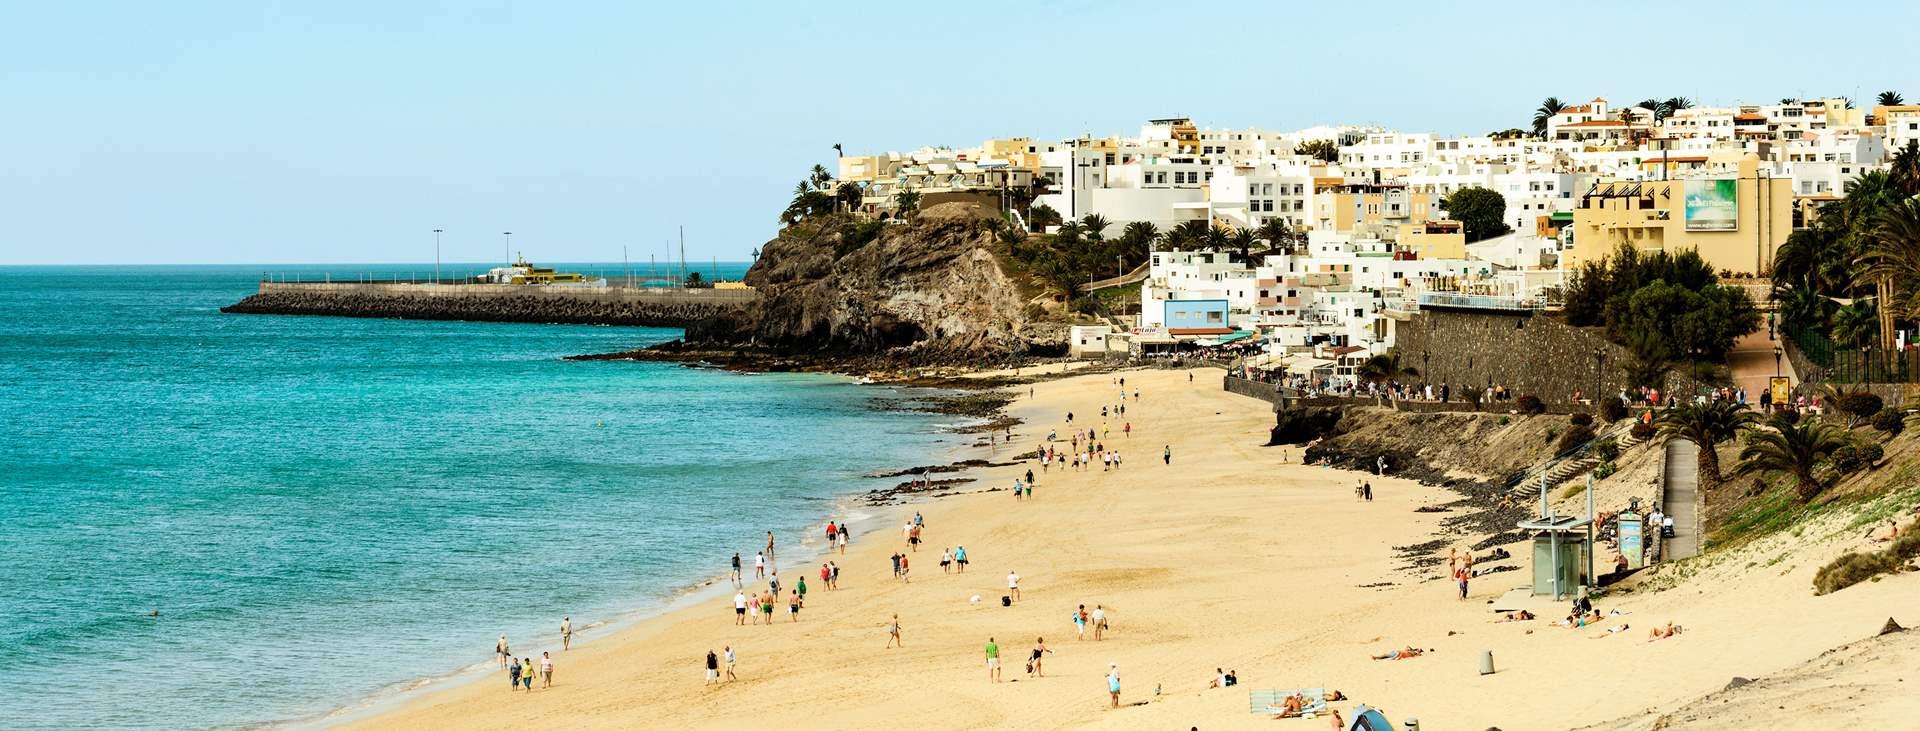 Bestill en reise med All Inclusive til Jandia på Fuerteventura